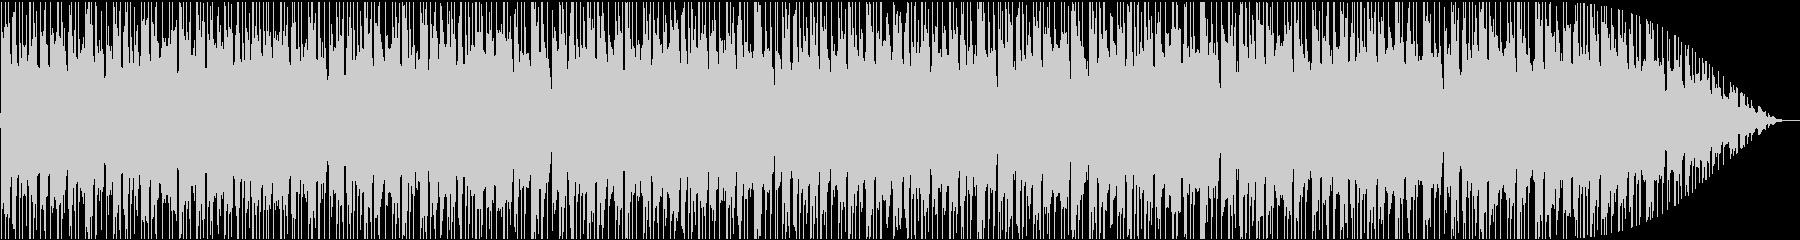 lofi・チル・ヒップホップの未再生の波形